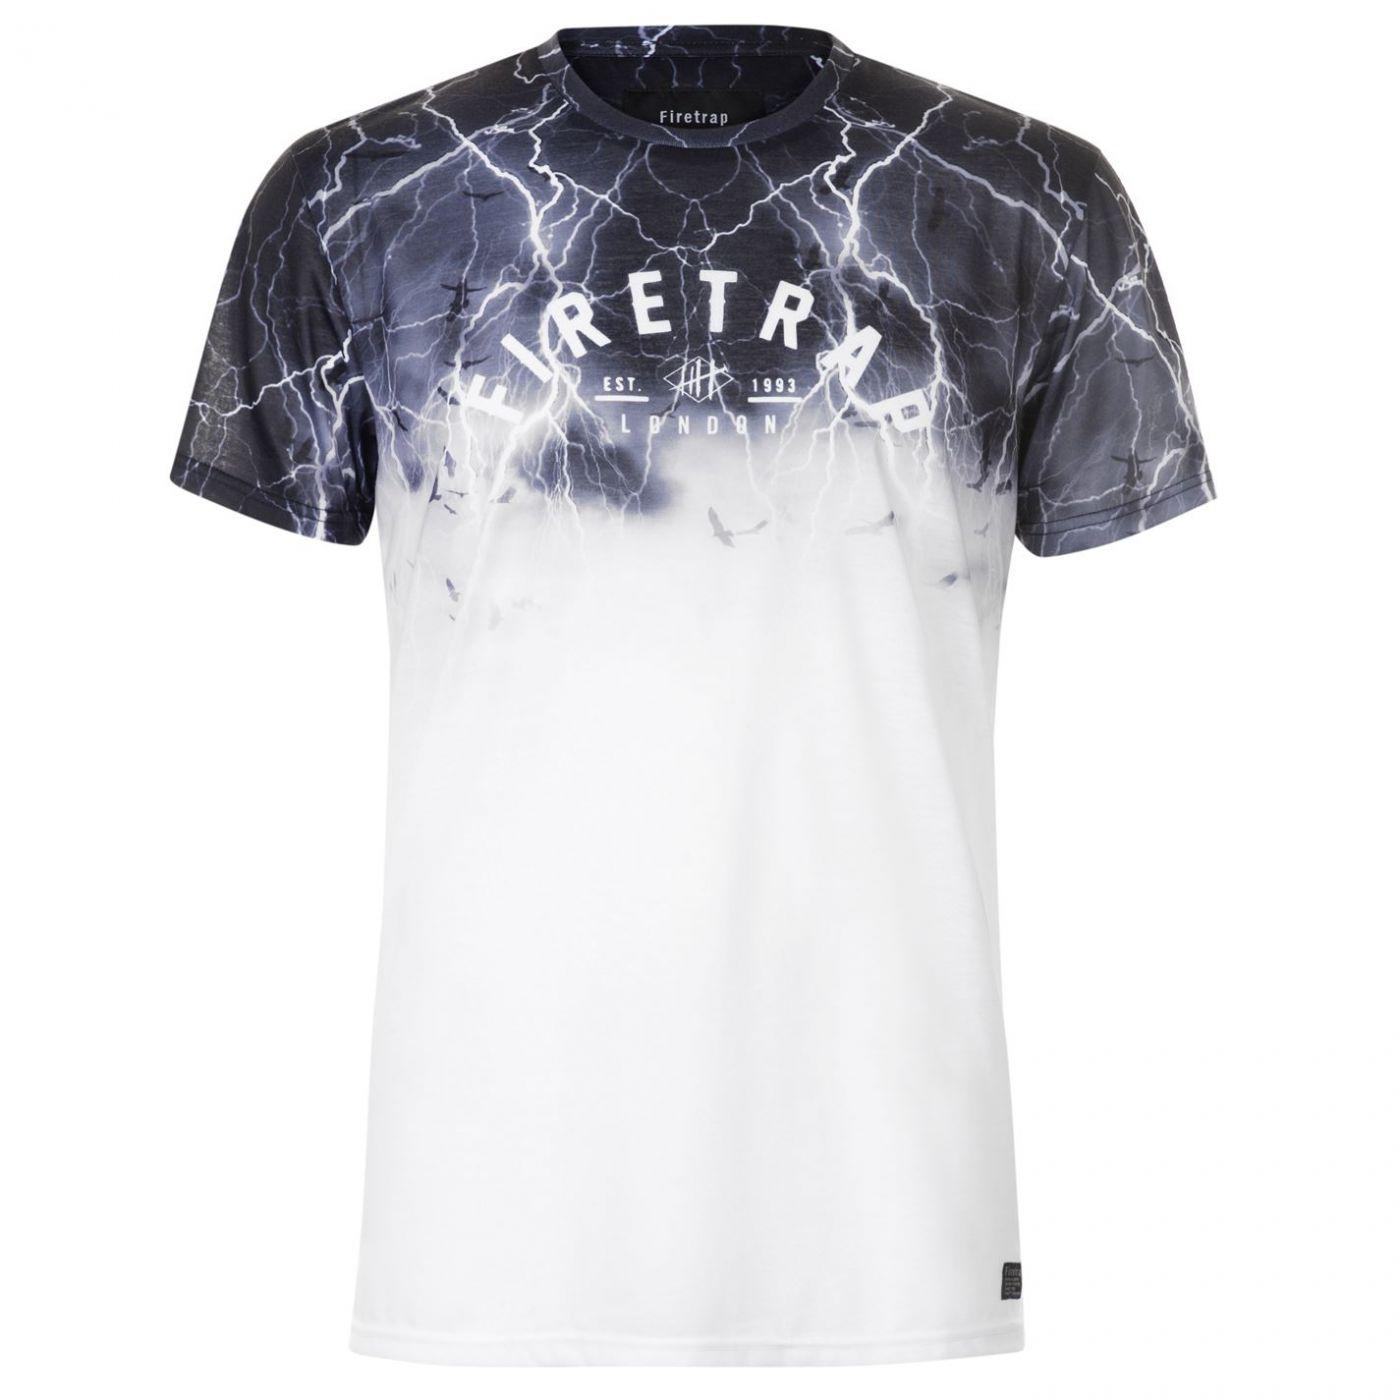 Firetrap Sub T Shirt Mens